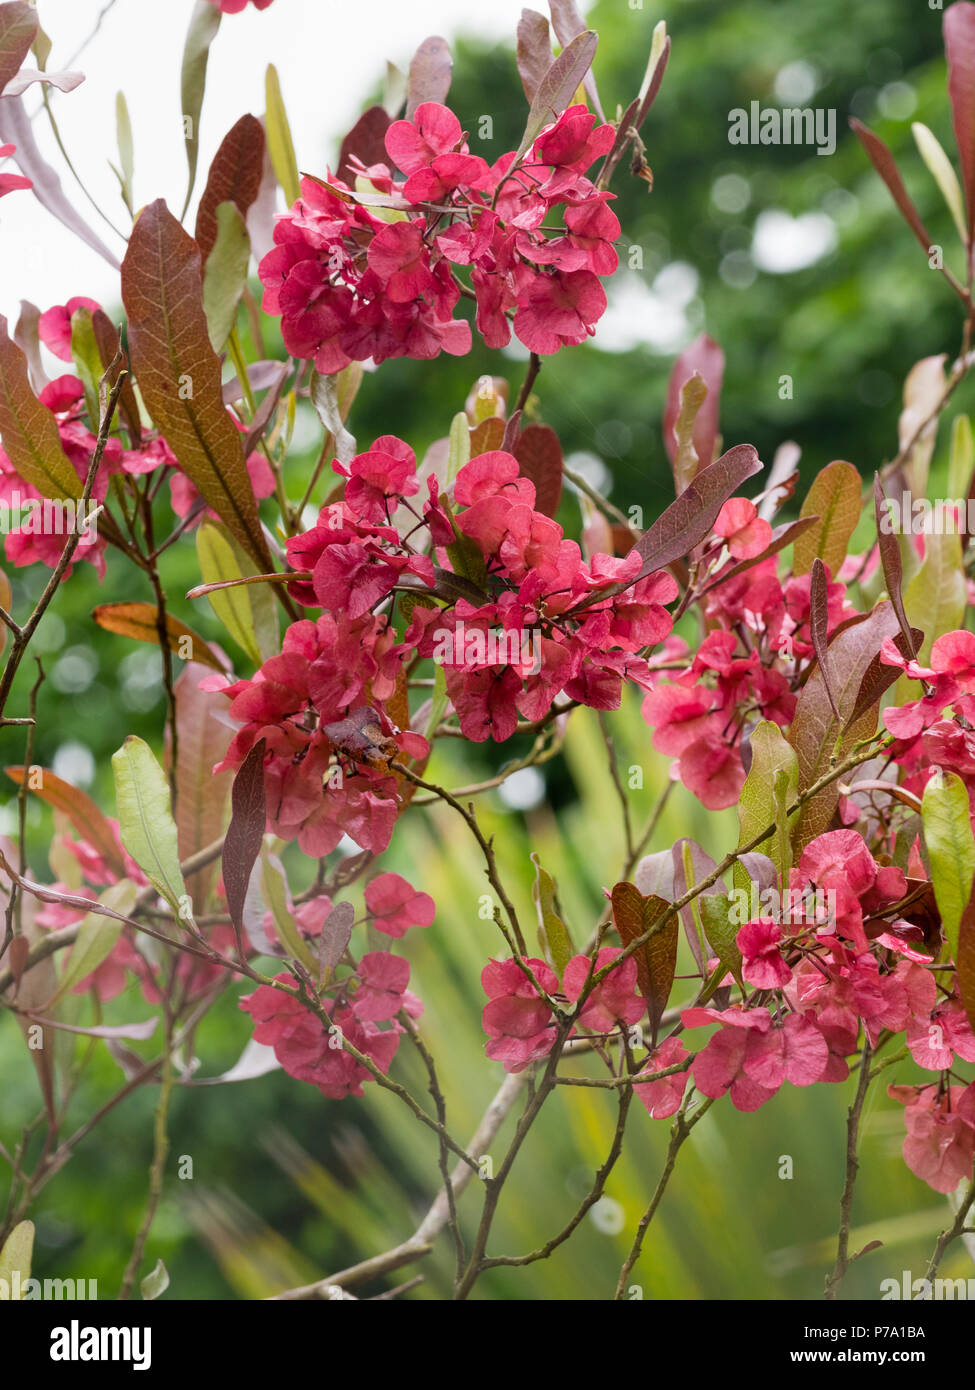 Showy red seed heads of the evergreen hop bush, Dodonaea viscosa - Stock Image